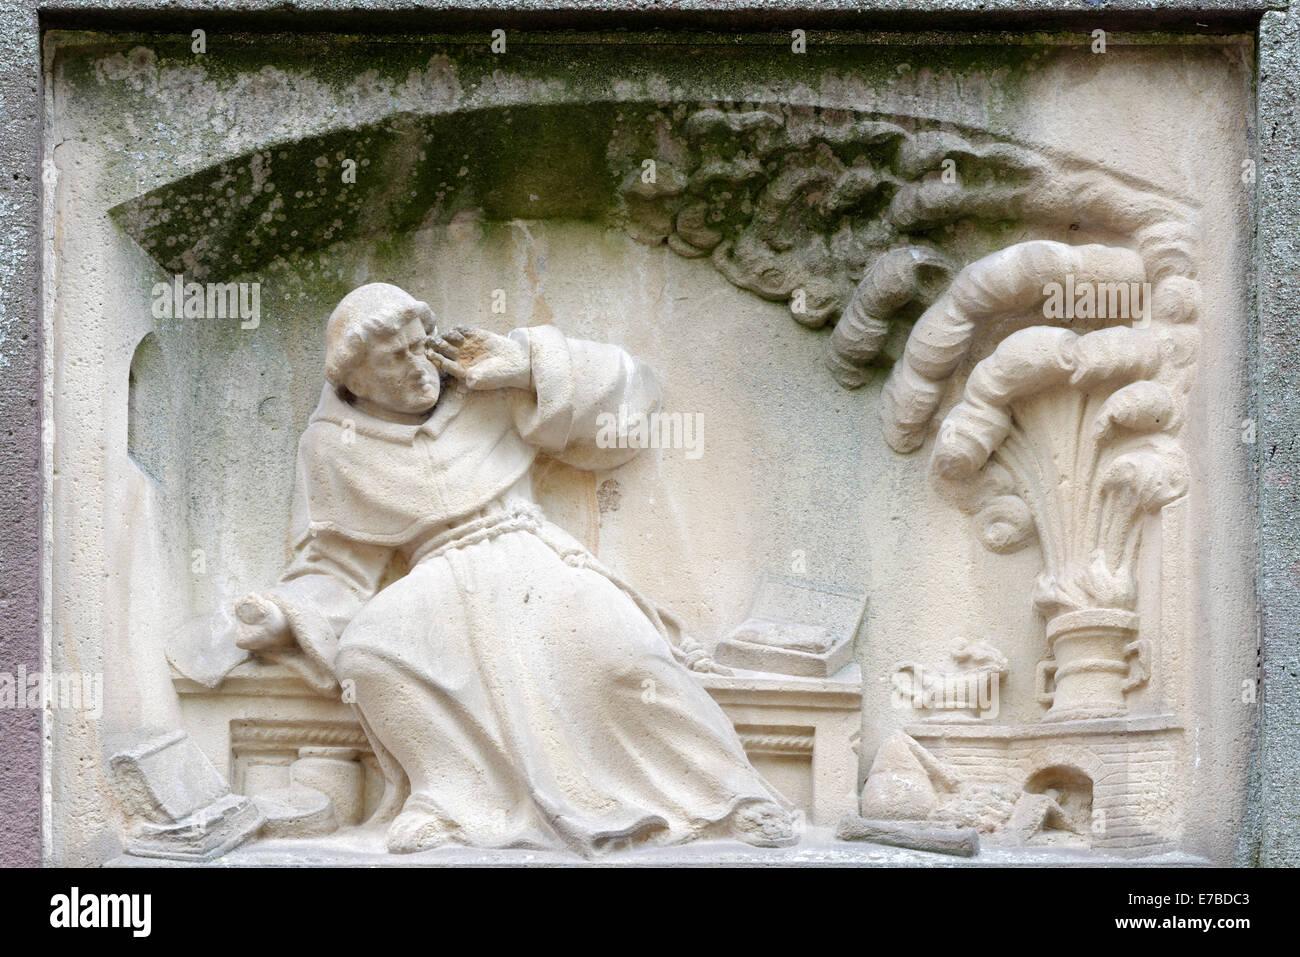 Relief of Berthold Schwarz, inventor of gunpowder, Berthold Schwarz Fountain by Josef Alois Knittel, 1855, Freiburg - Stock Image